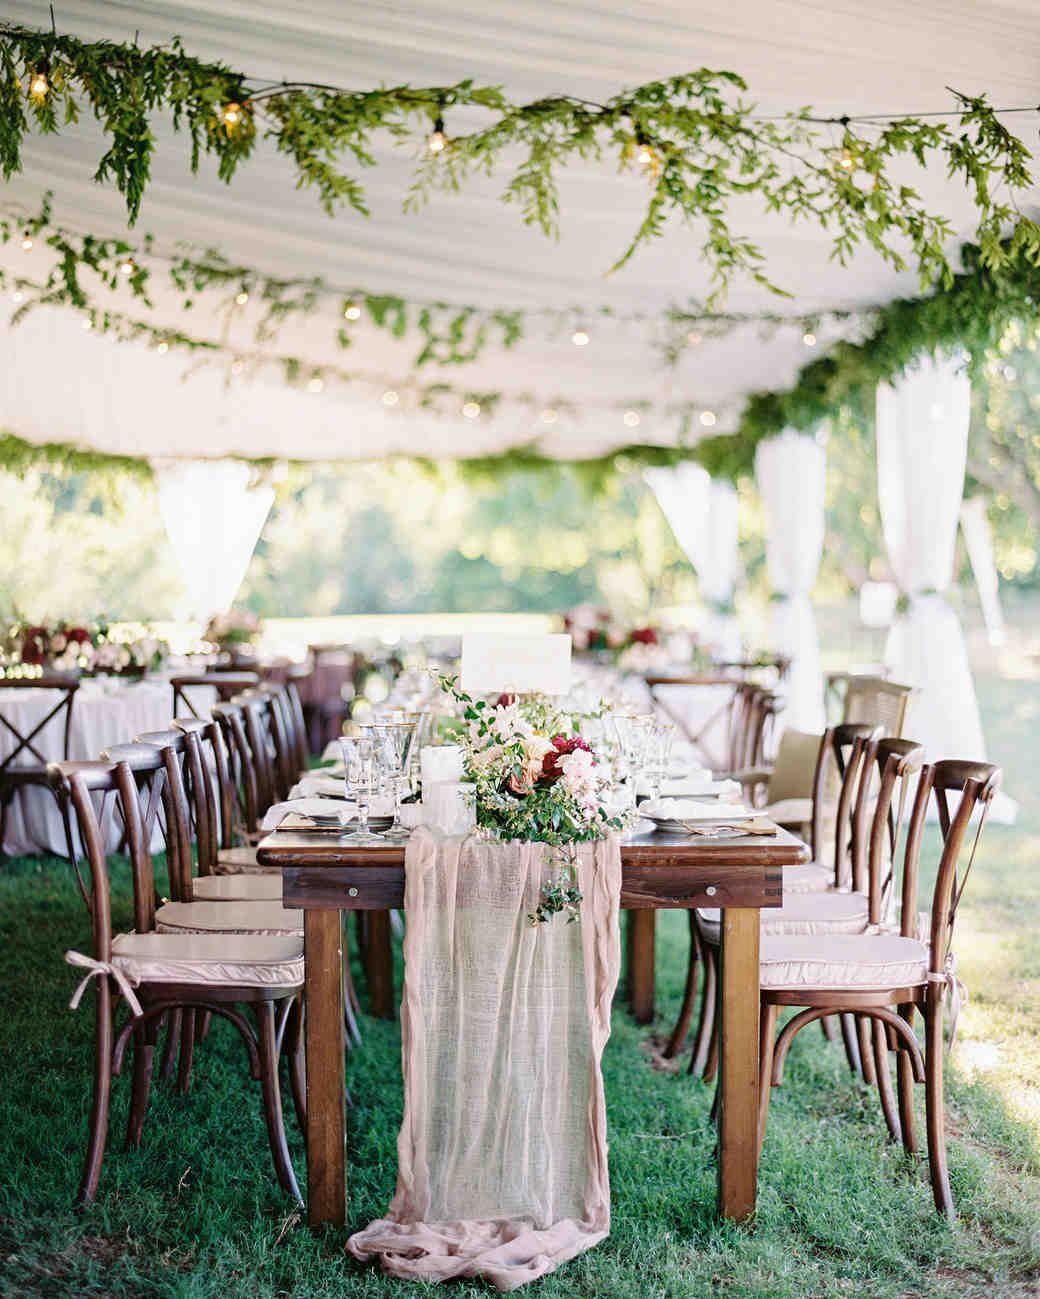 Romantic Wedding Decoration Ideas: A Romantic, Flower-Filled Wedding In Oklahoma